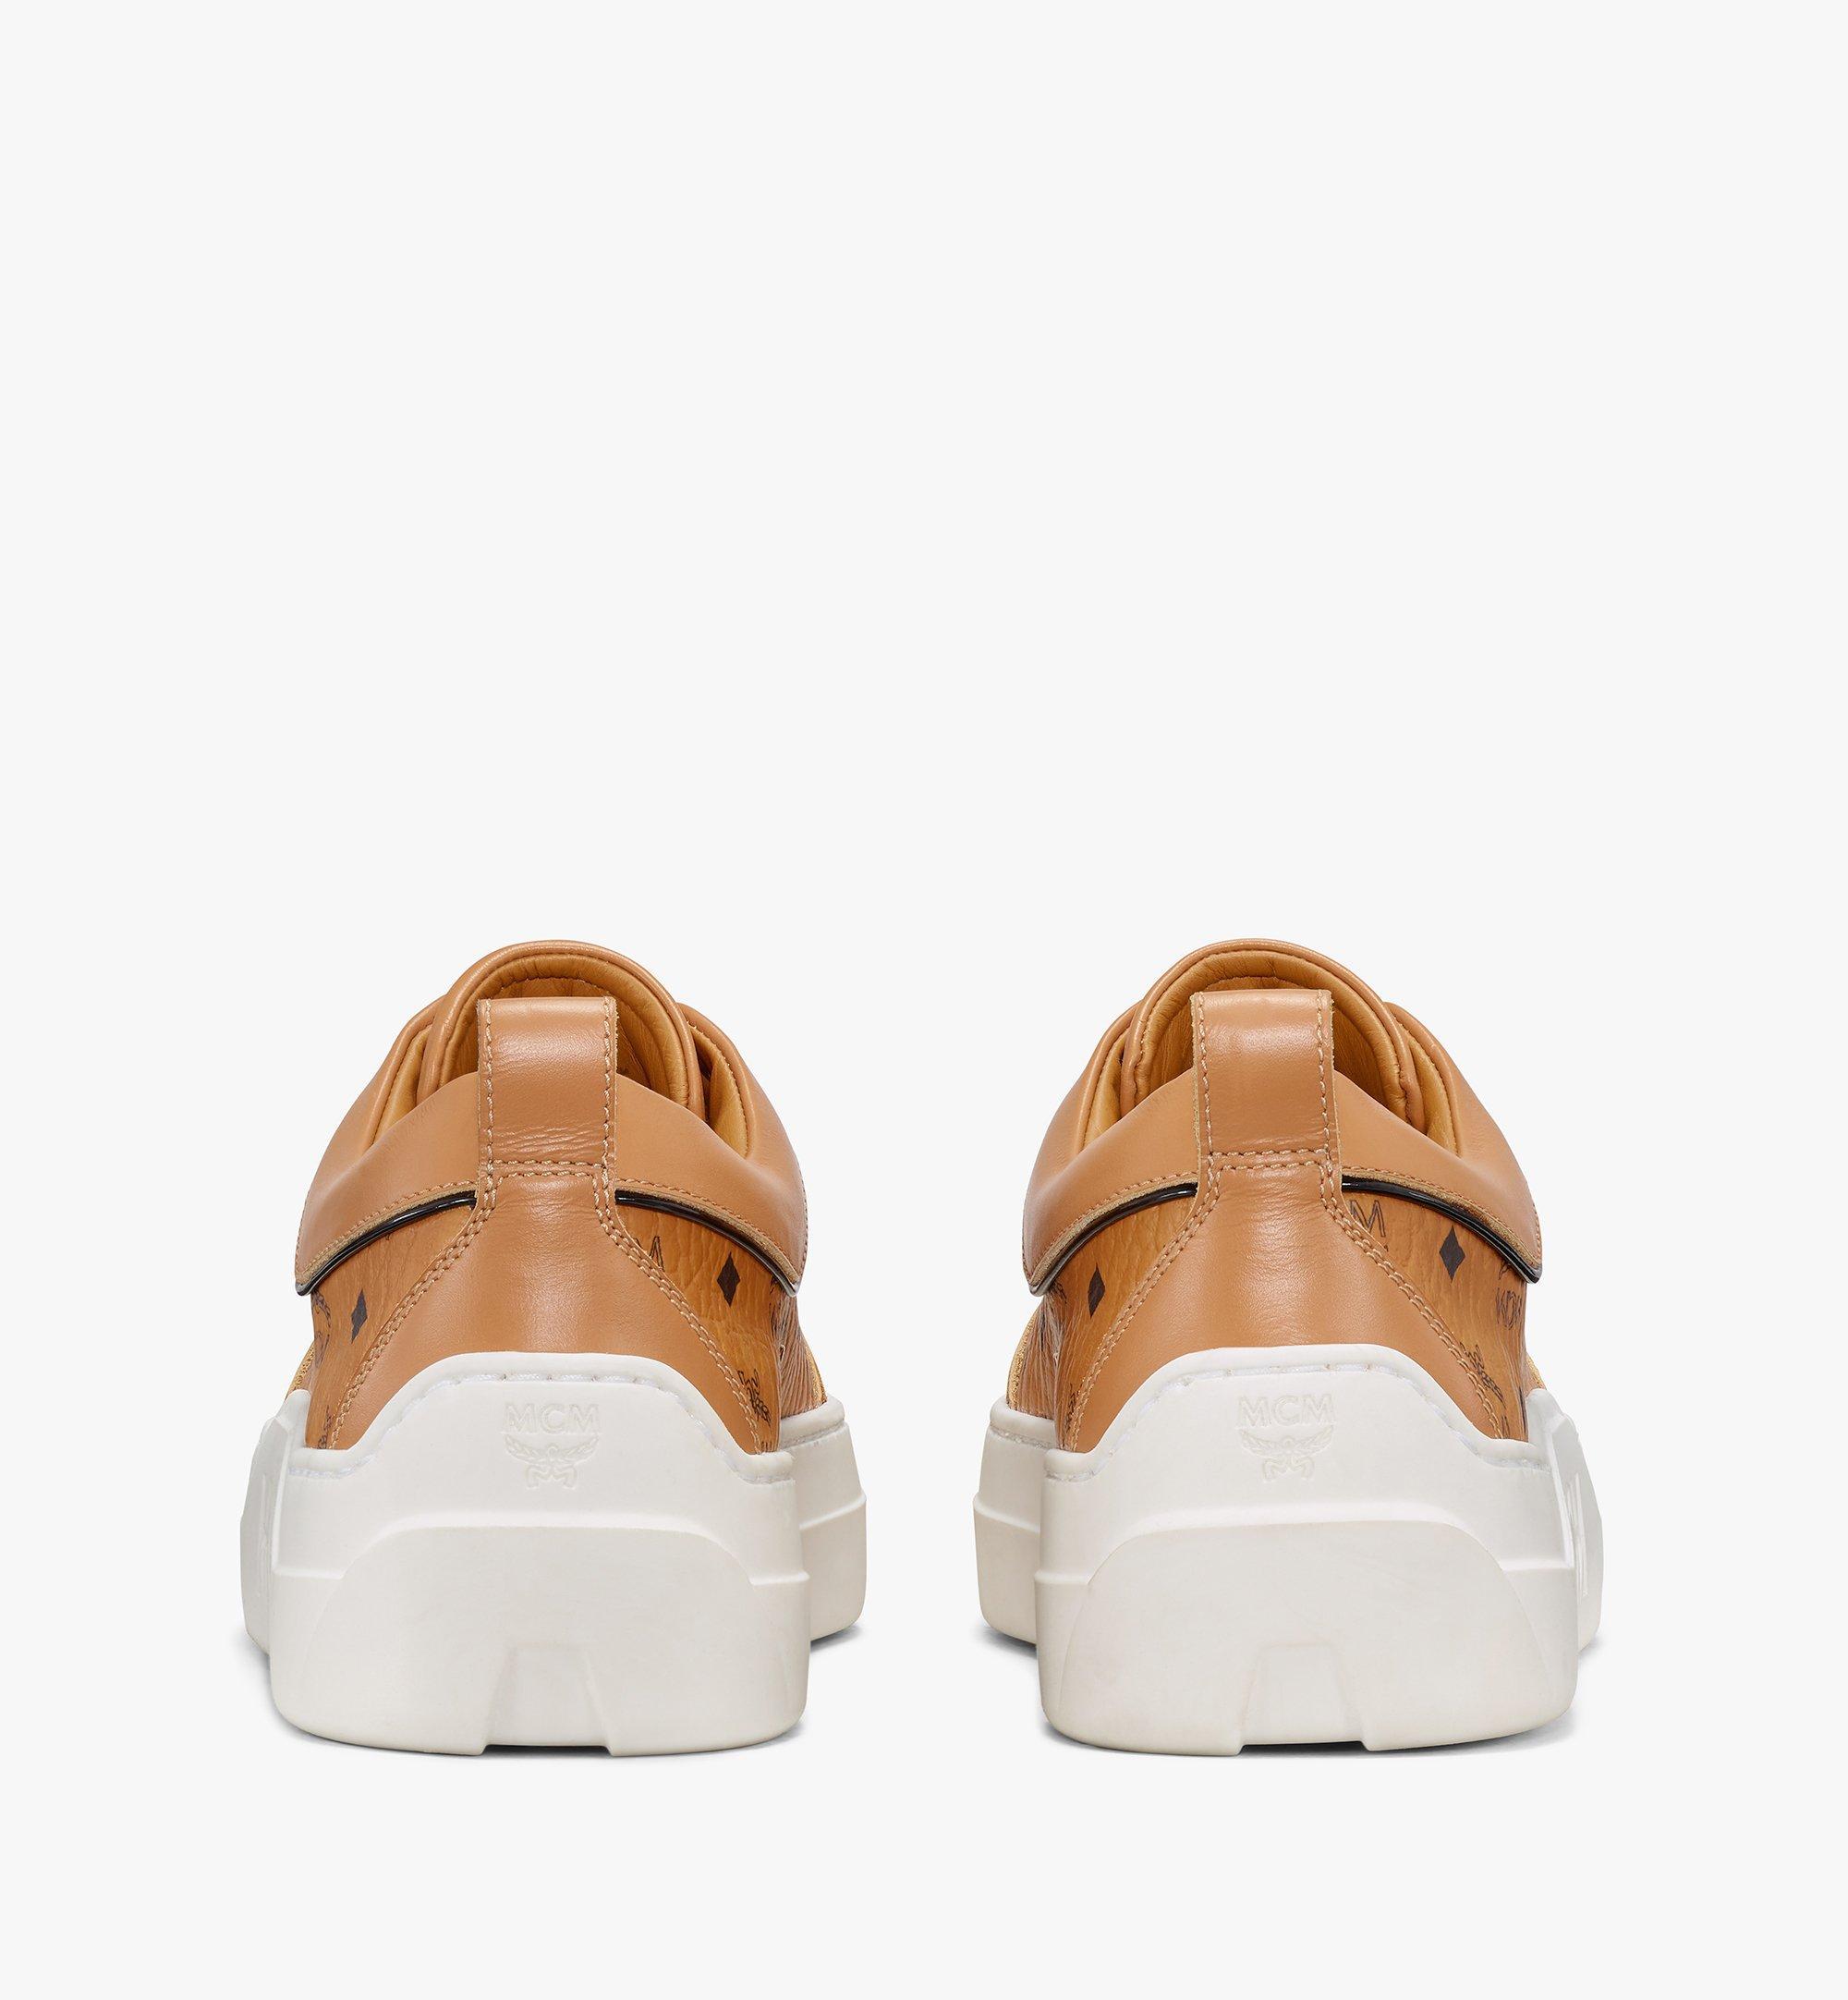 MCM Women's Skyward Platform Sneakers in Visetos Cognac MESAAMM19CO039 Alternate View 2